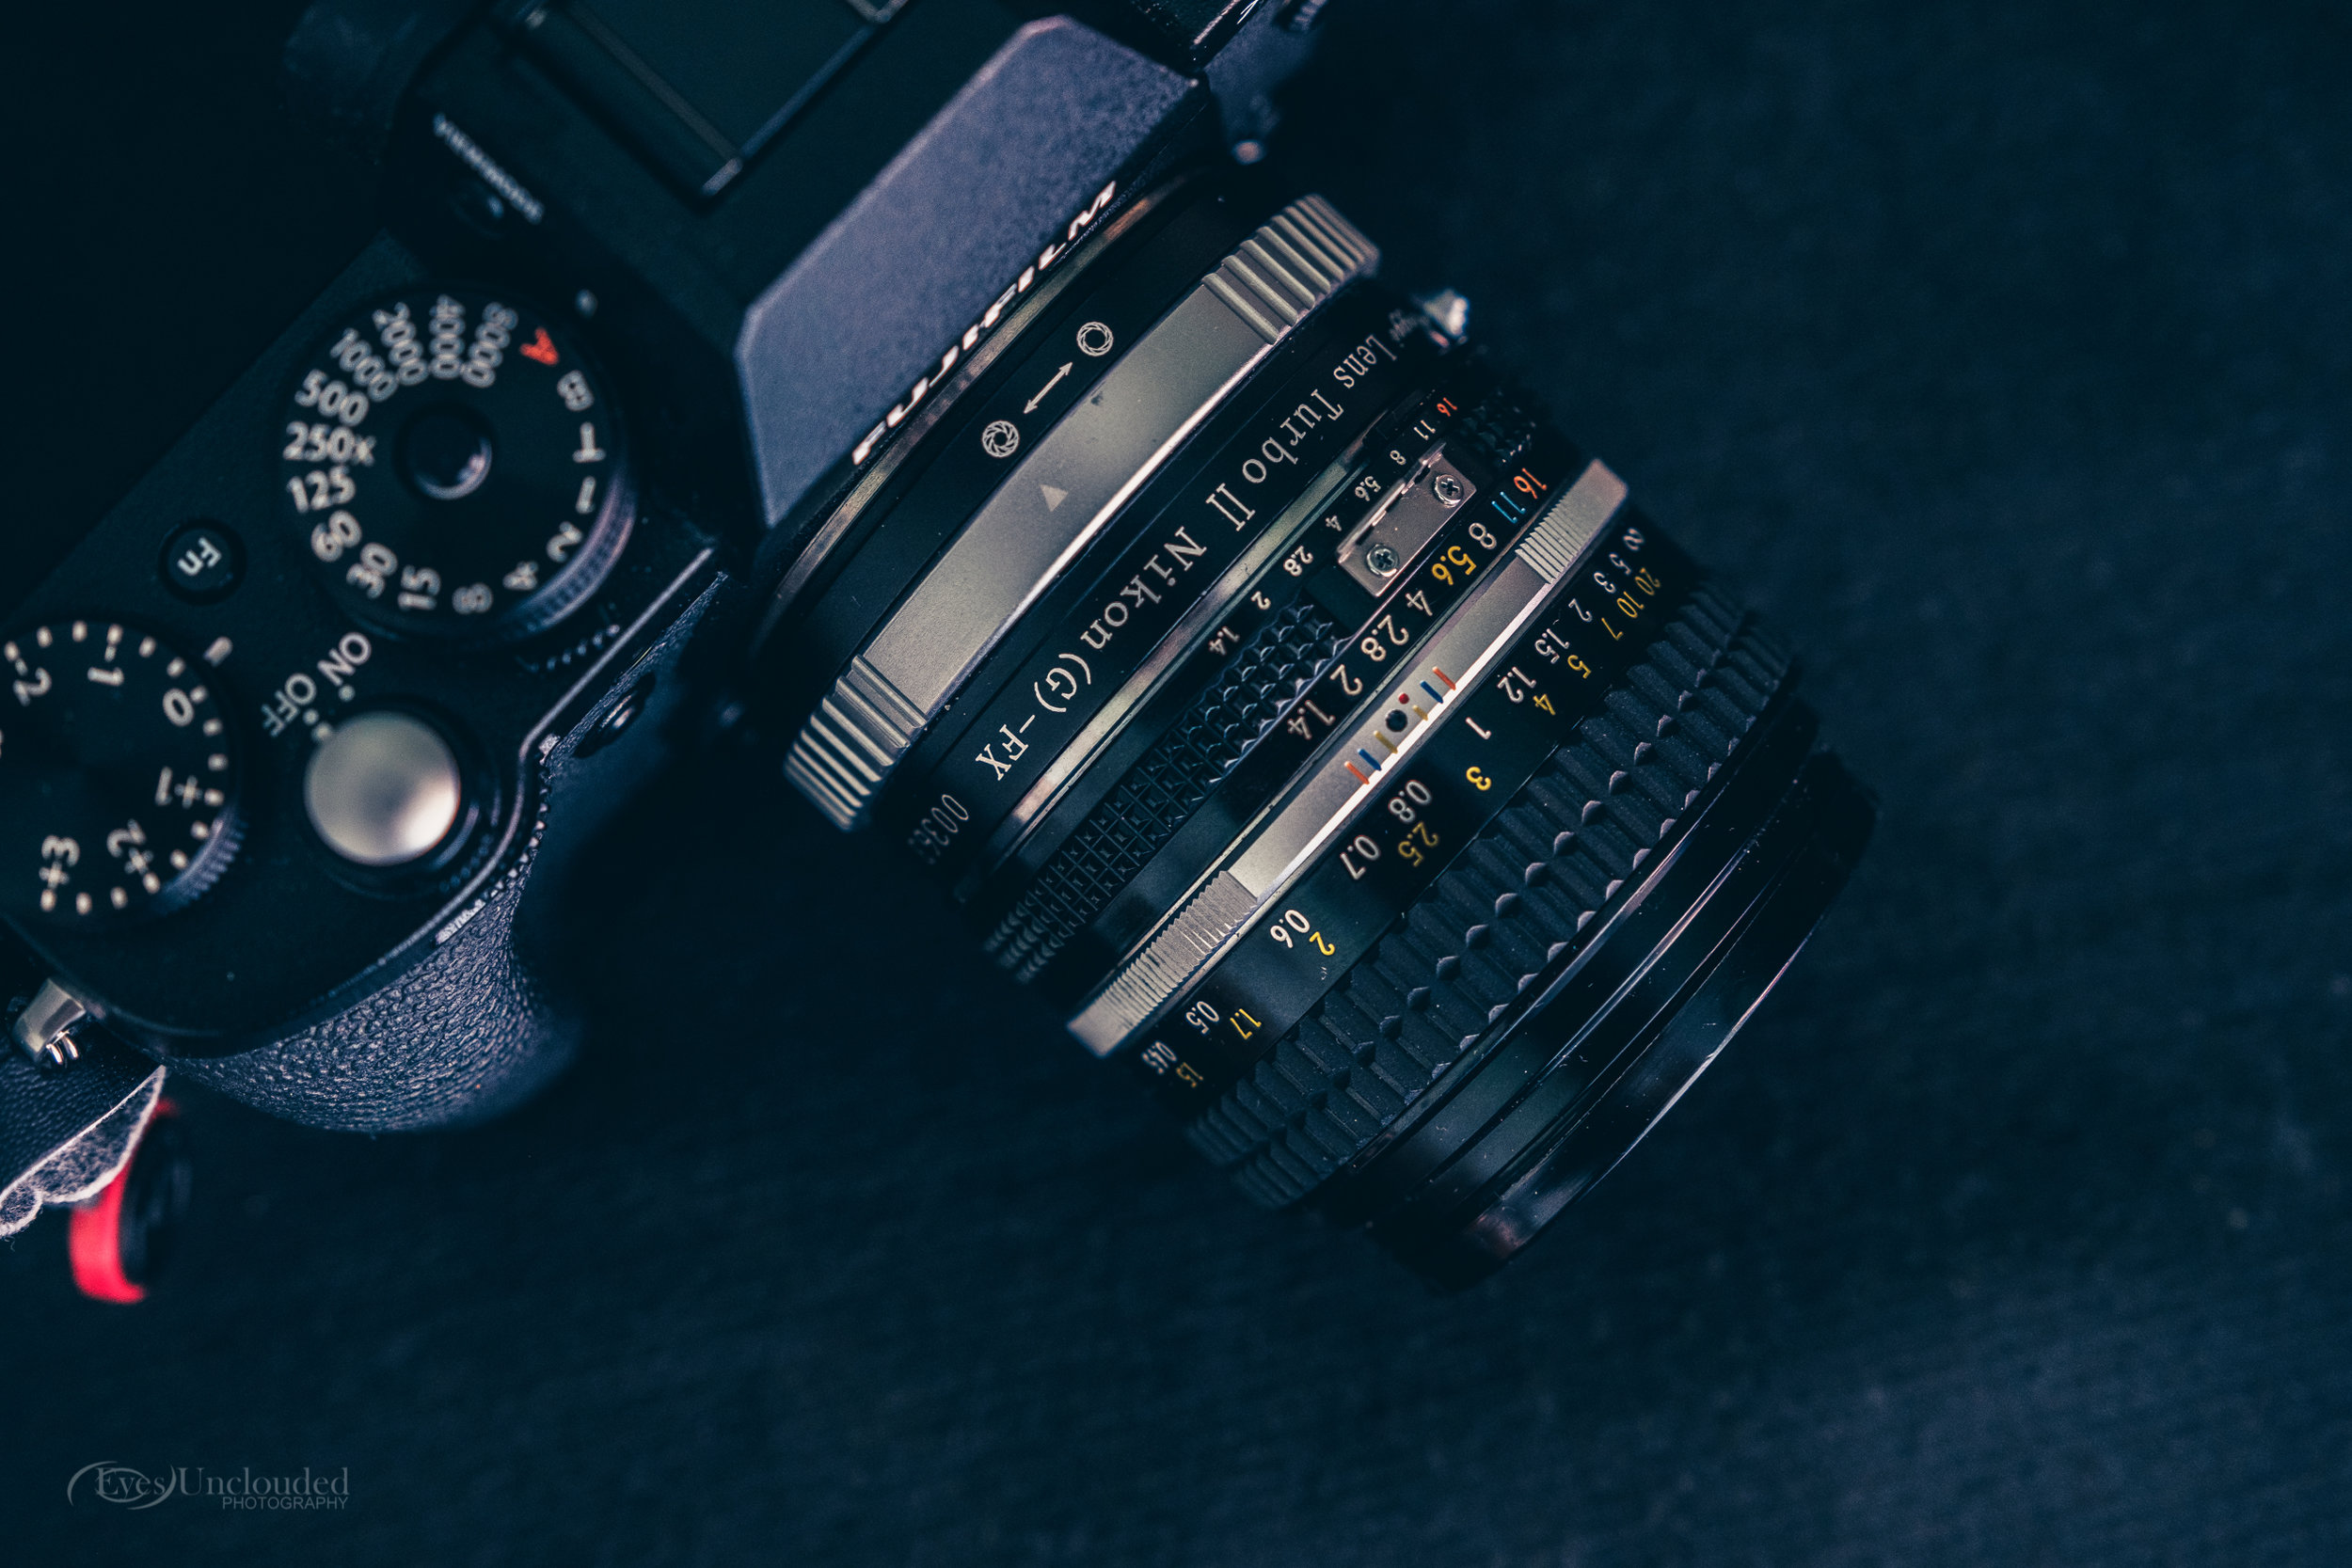 DFXP1155.jpg